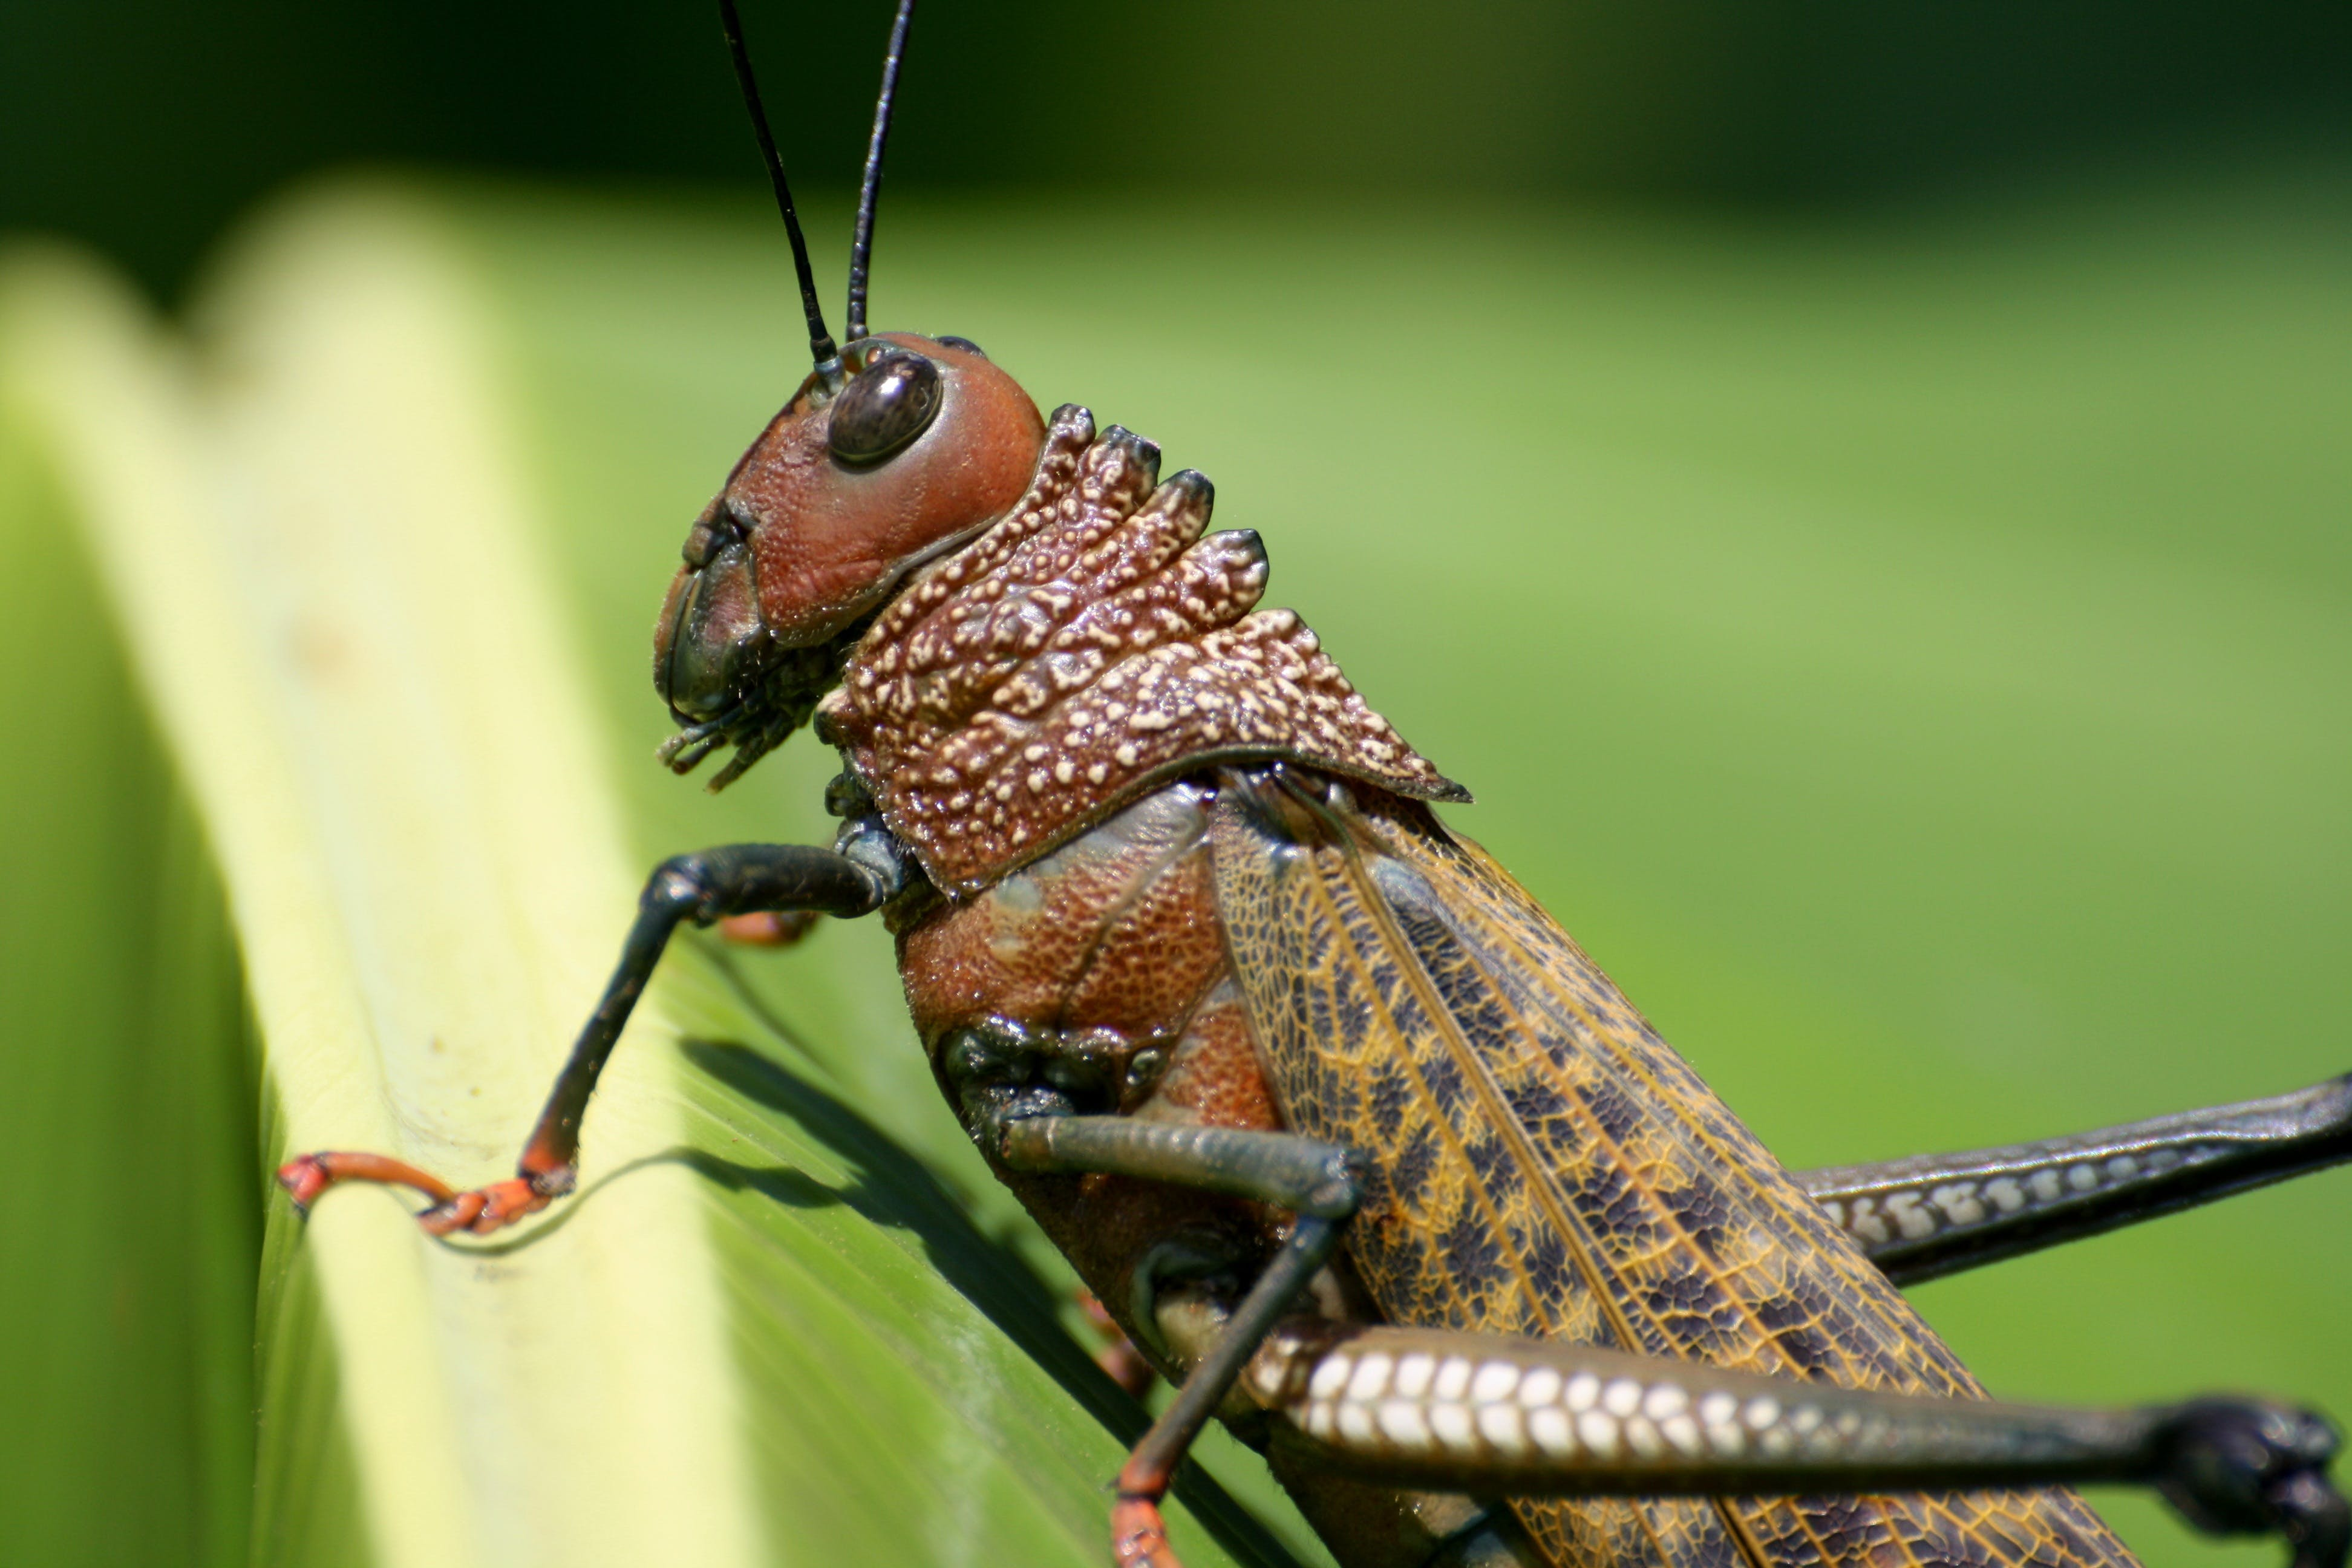 Brown Grasshopper on Green Plant